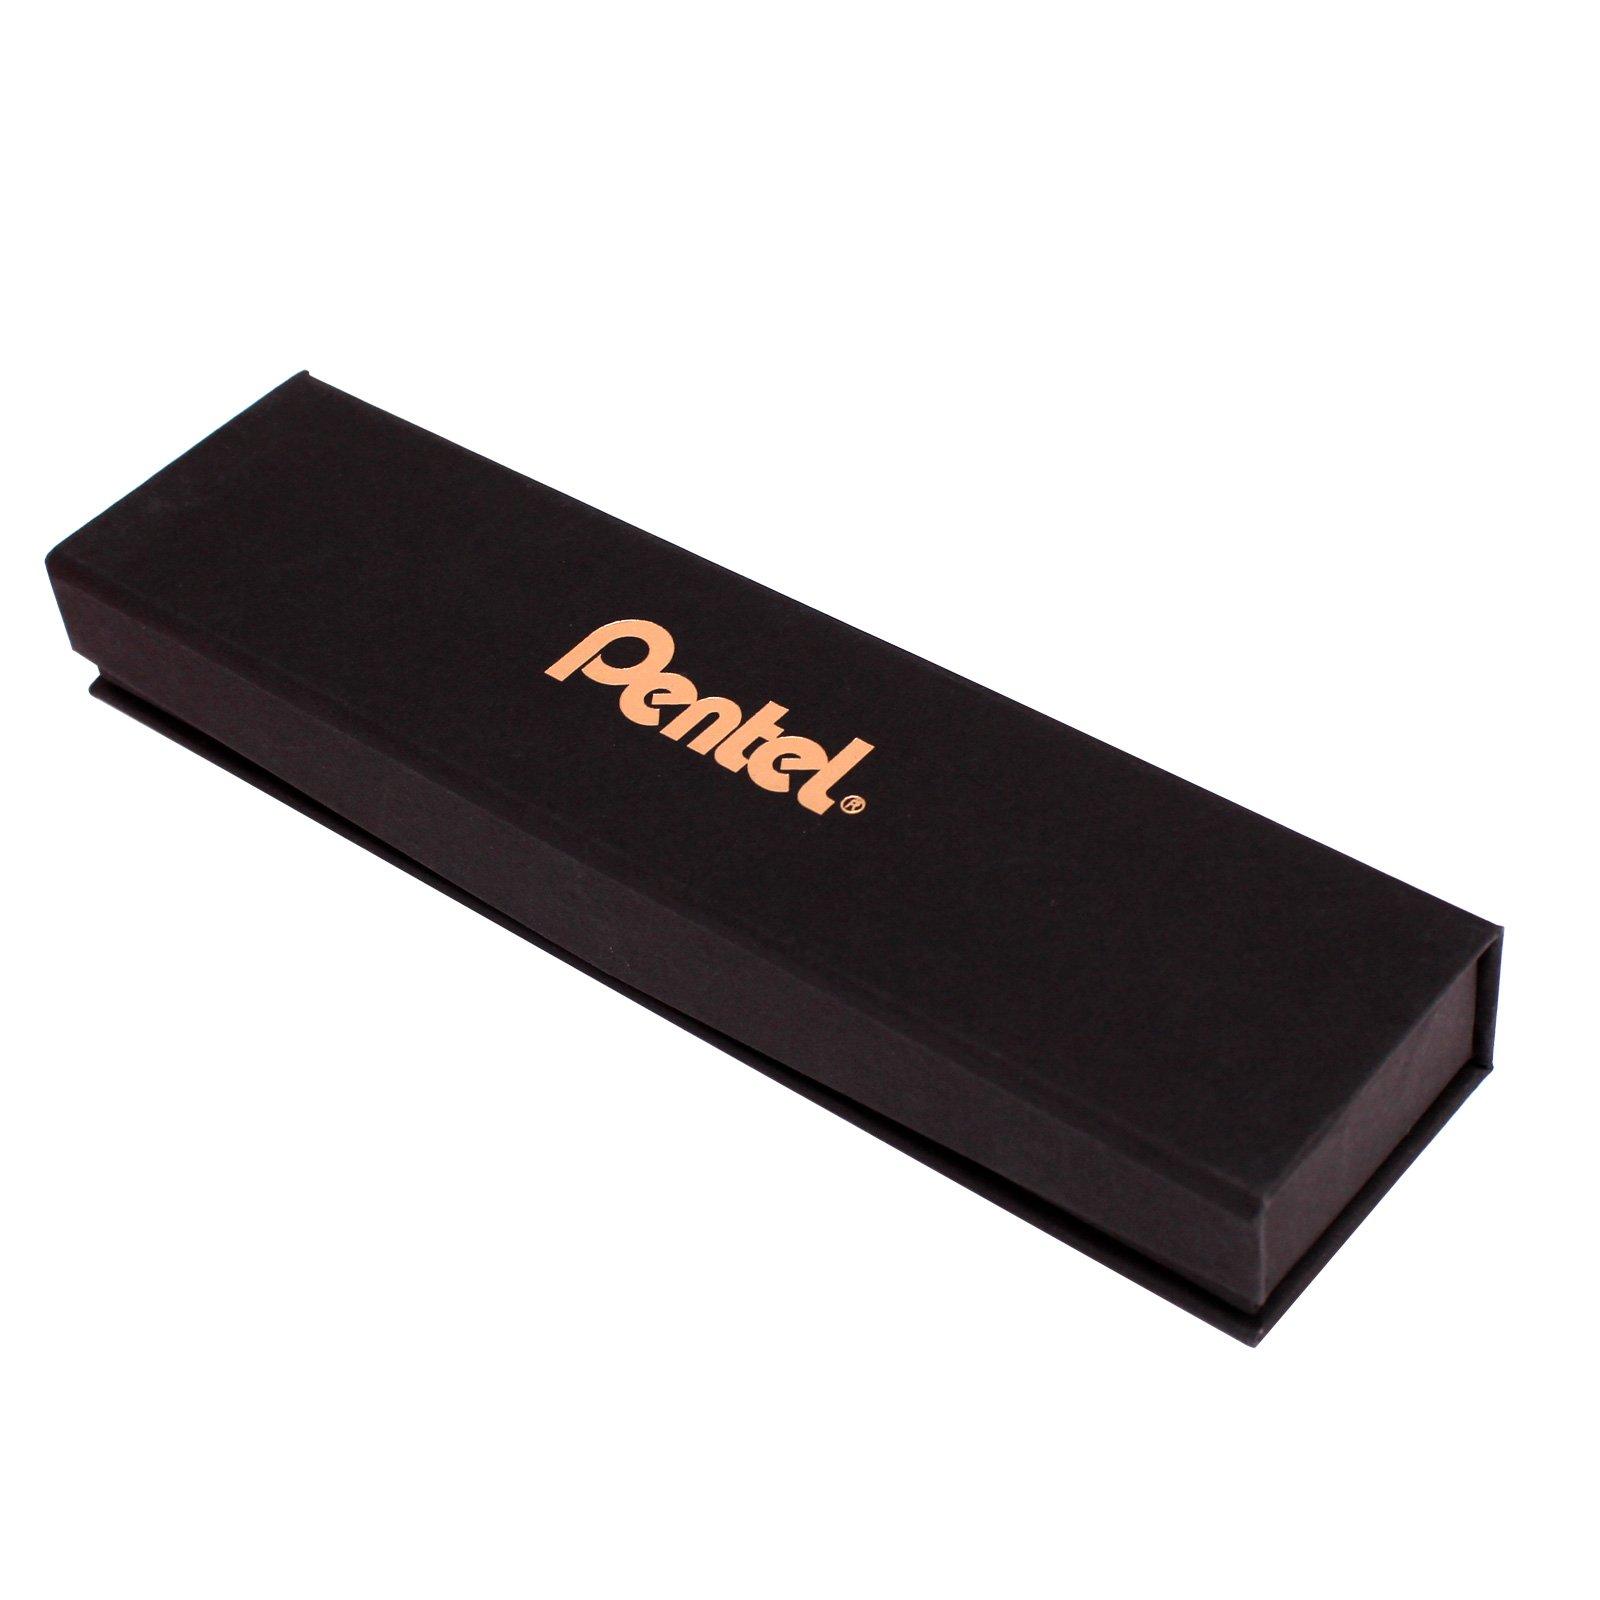 Pentel Graphgear 1000 Gold Limited Edition Mechanical Pencil (PG1015LG) Ain Lead (Black)